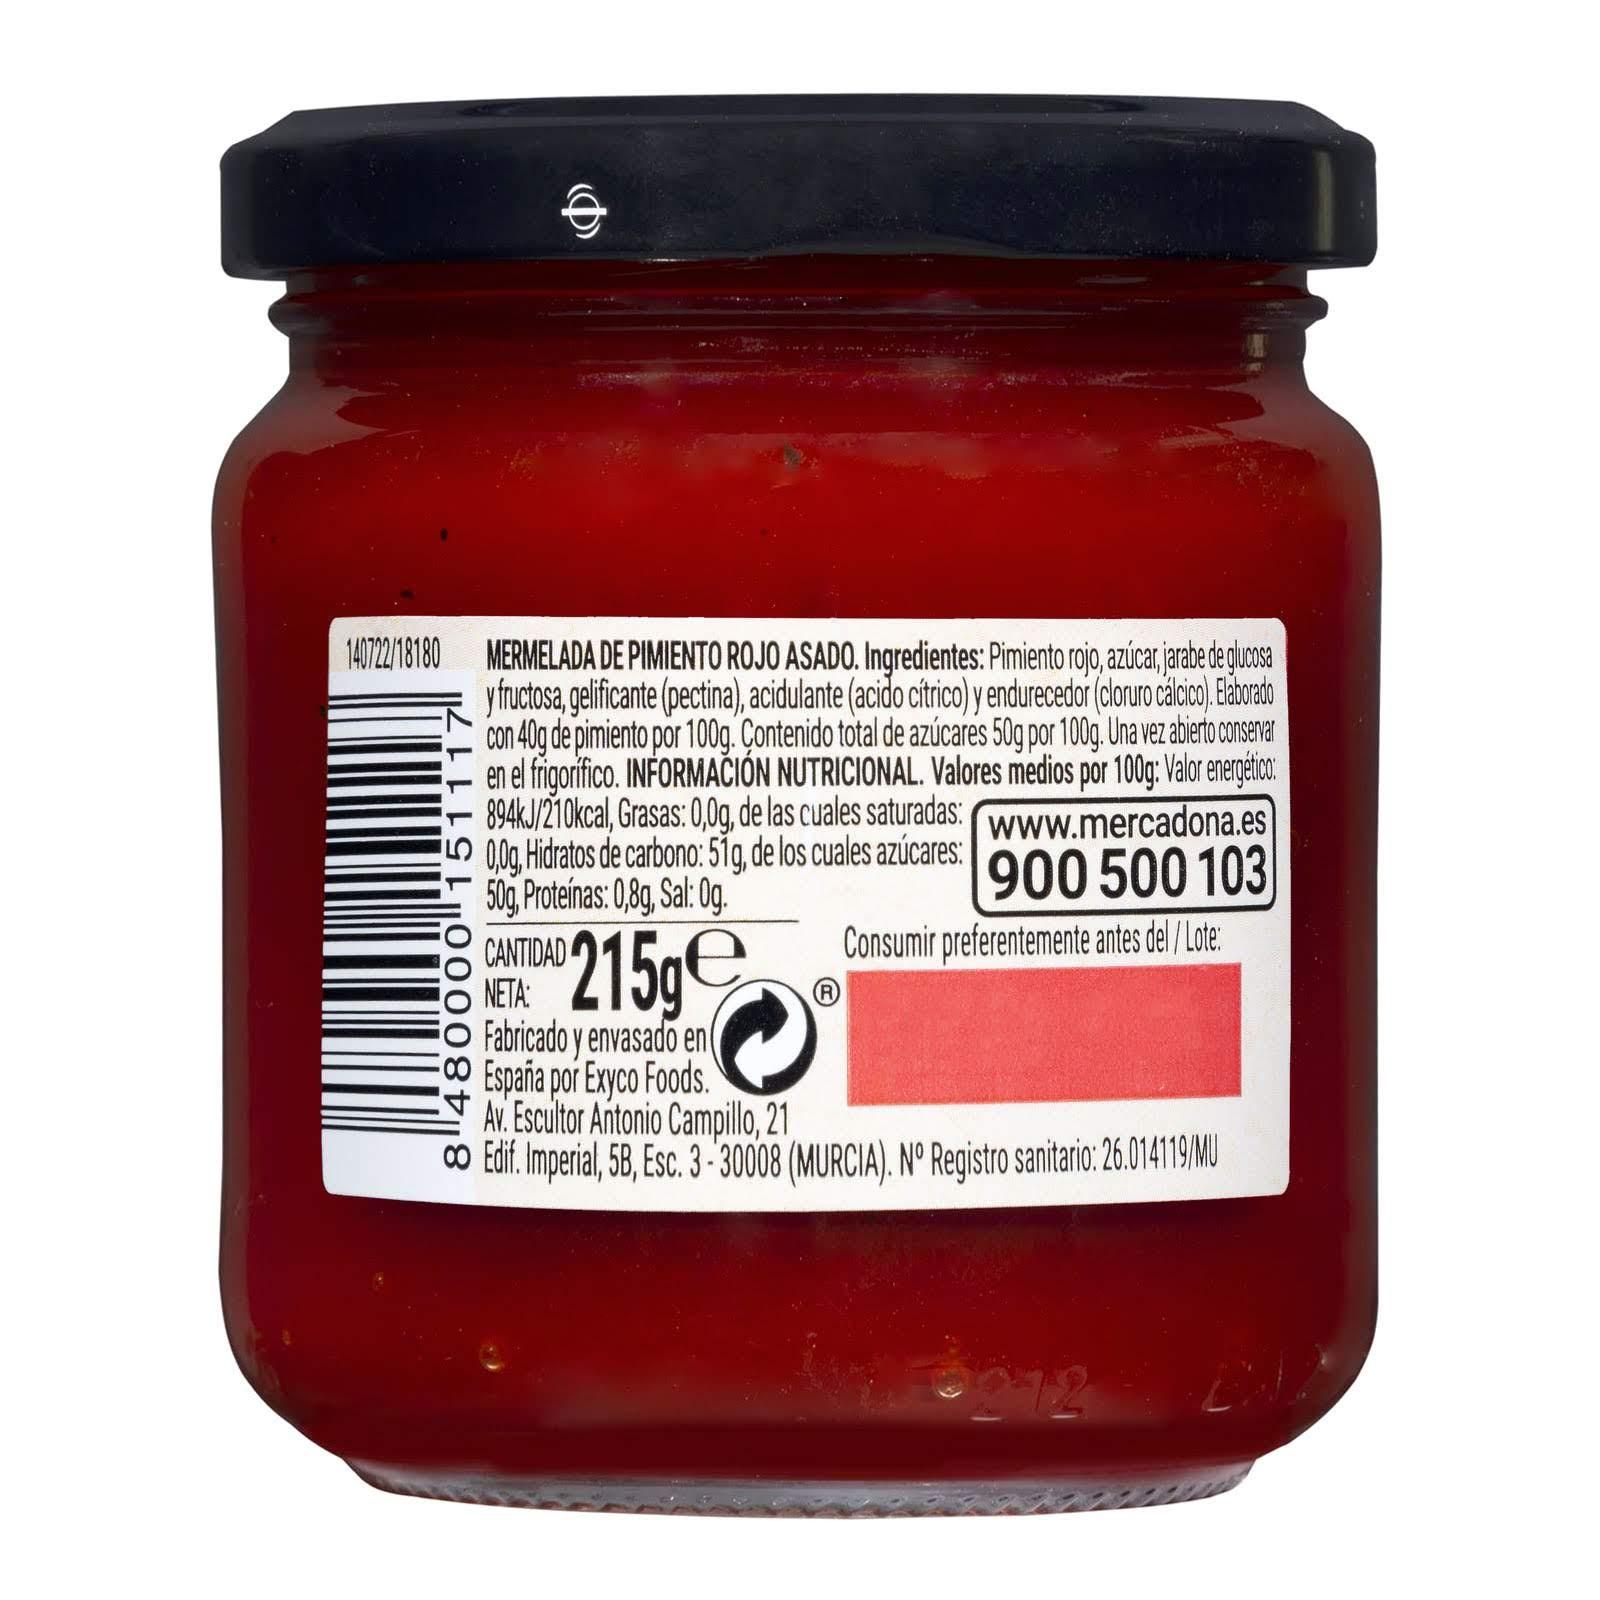 Mermelada de pimiento rojo Hacendado